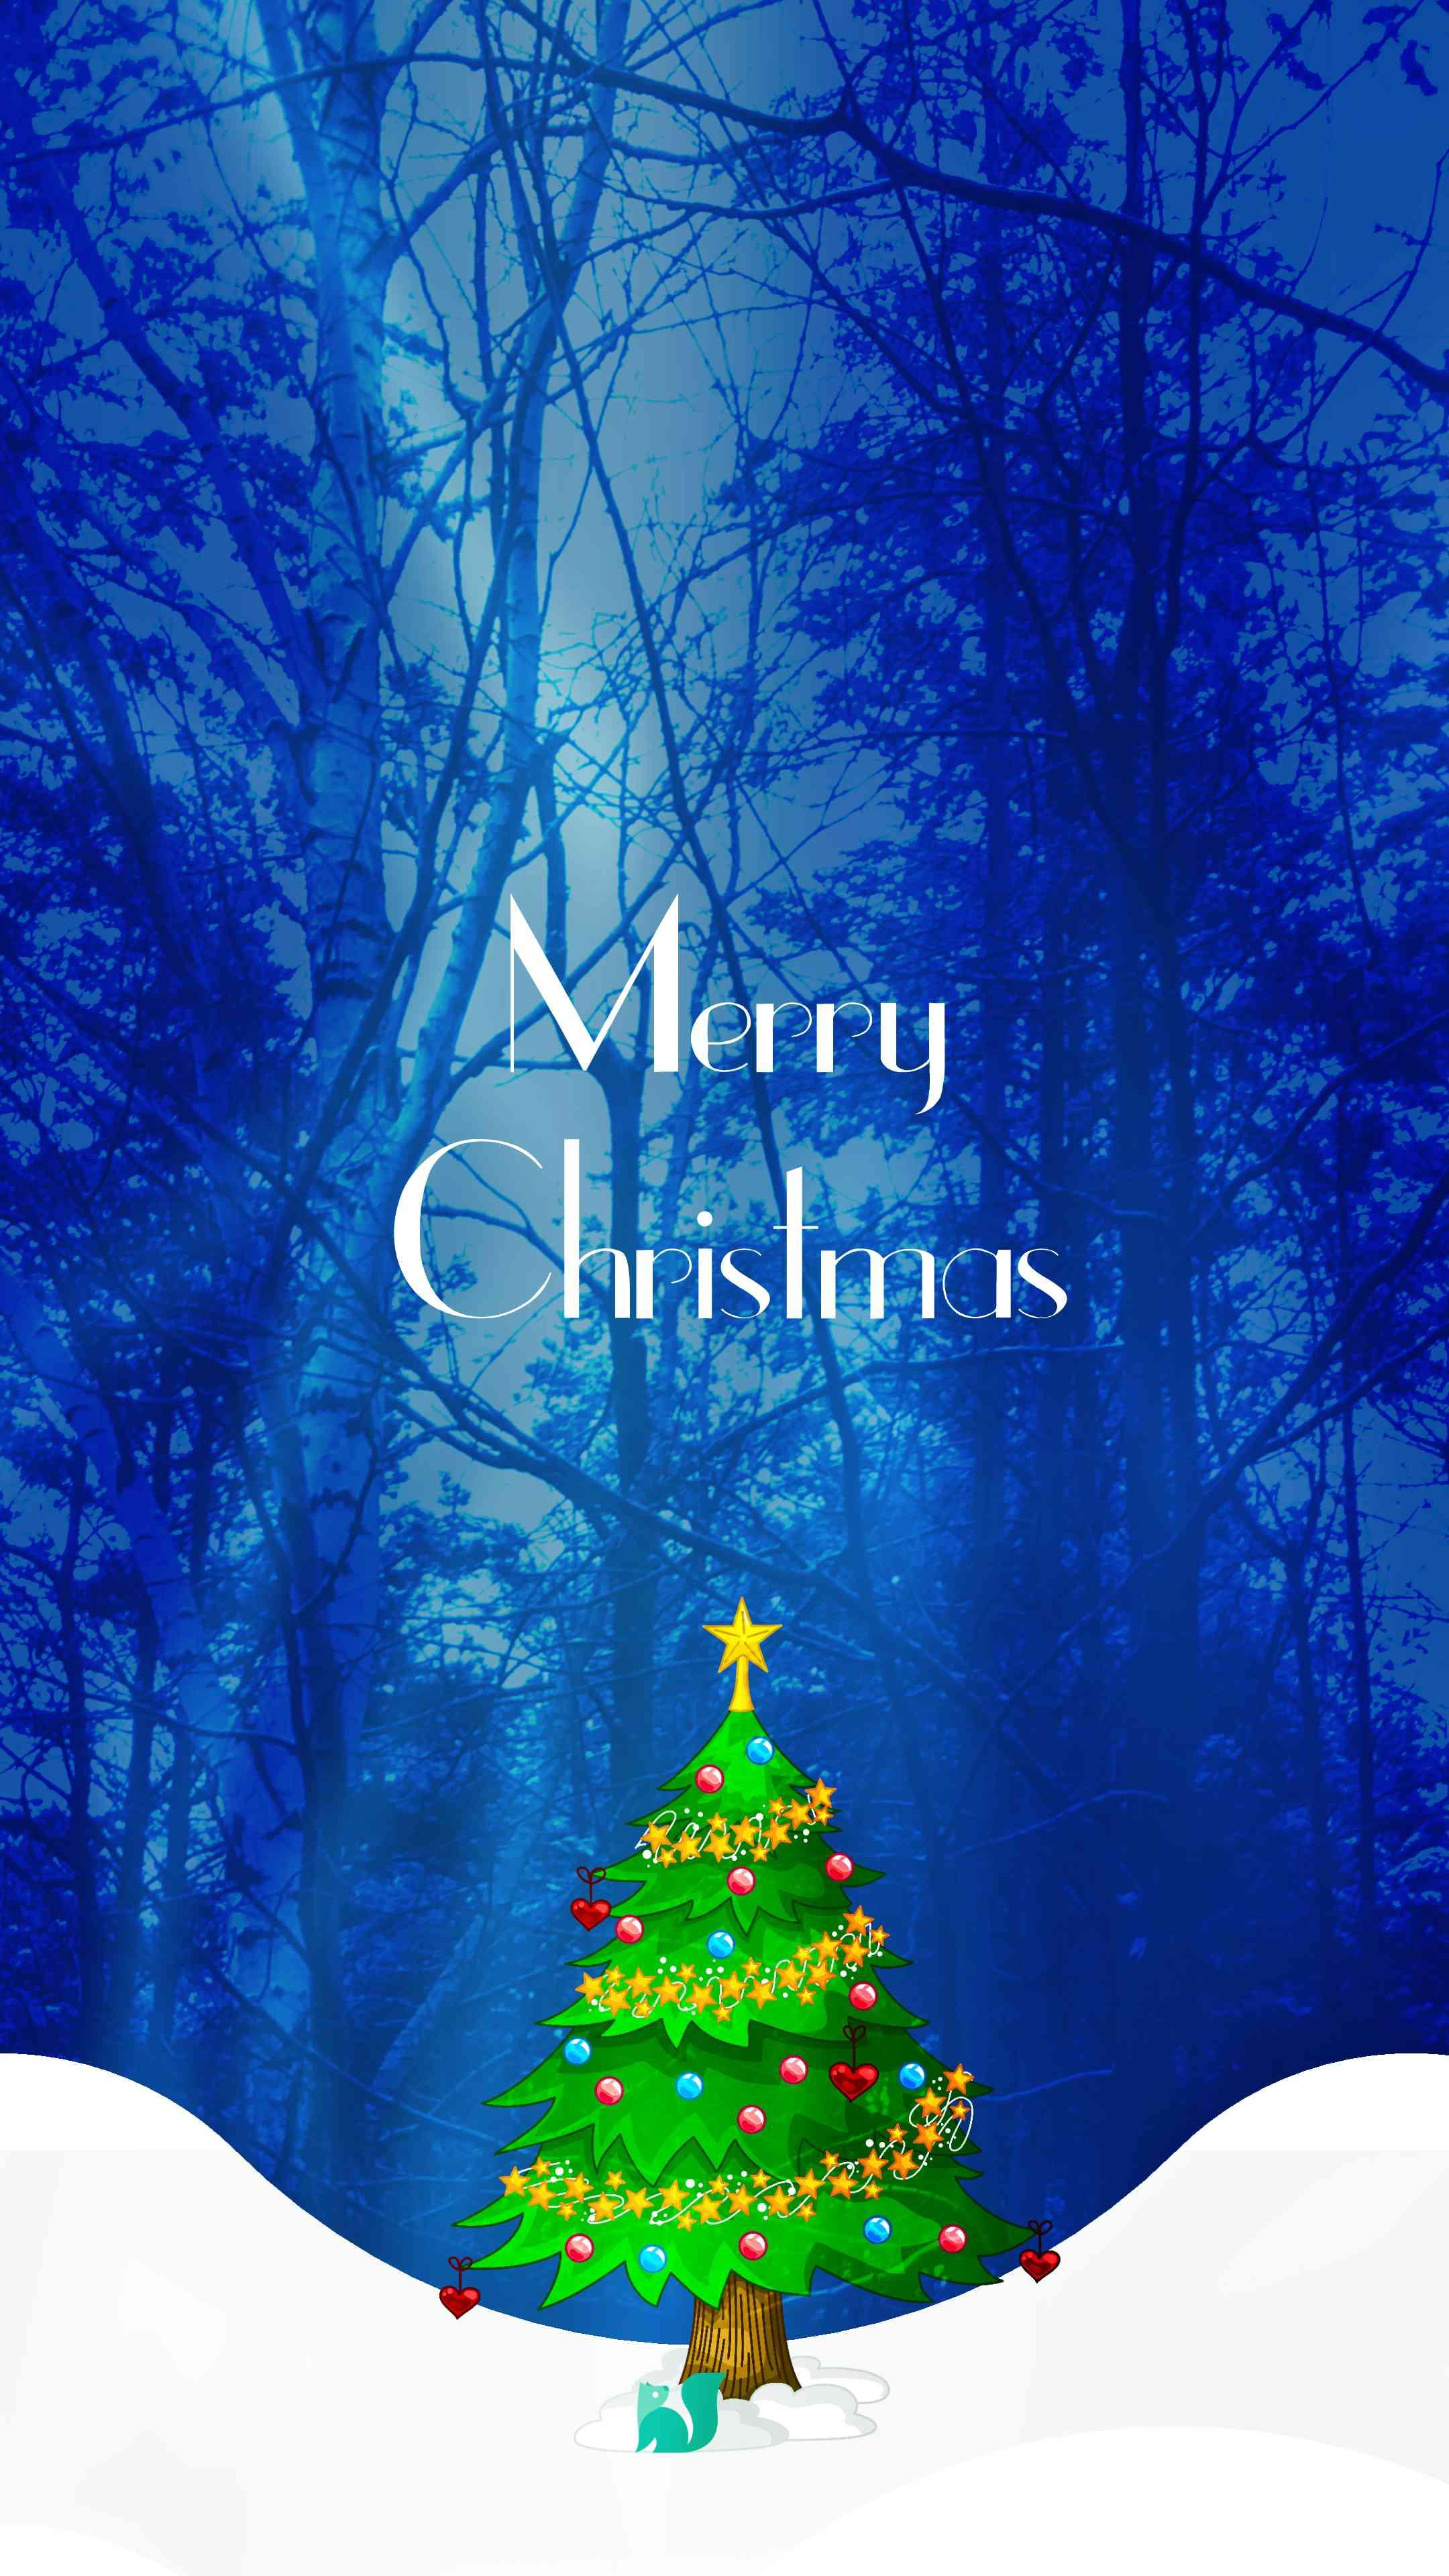 Merry Christmas Snow Tree iPhone Wallpaper